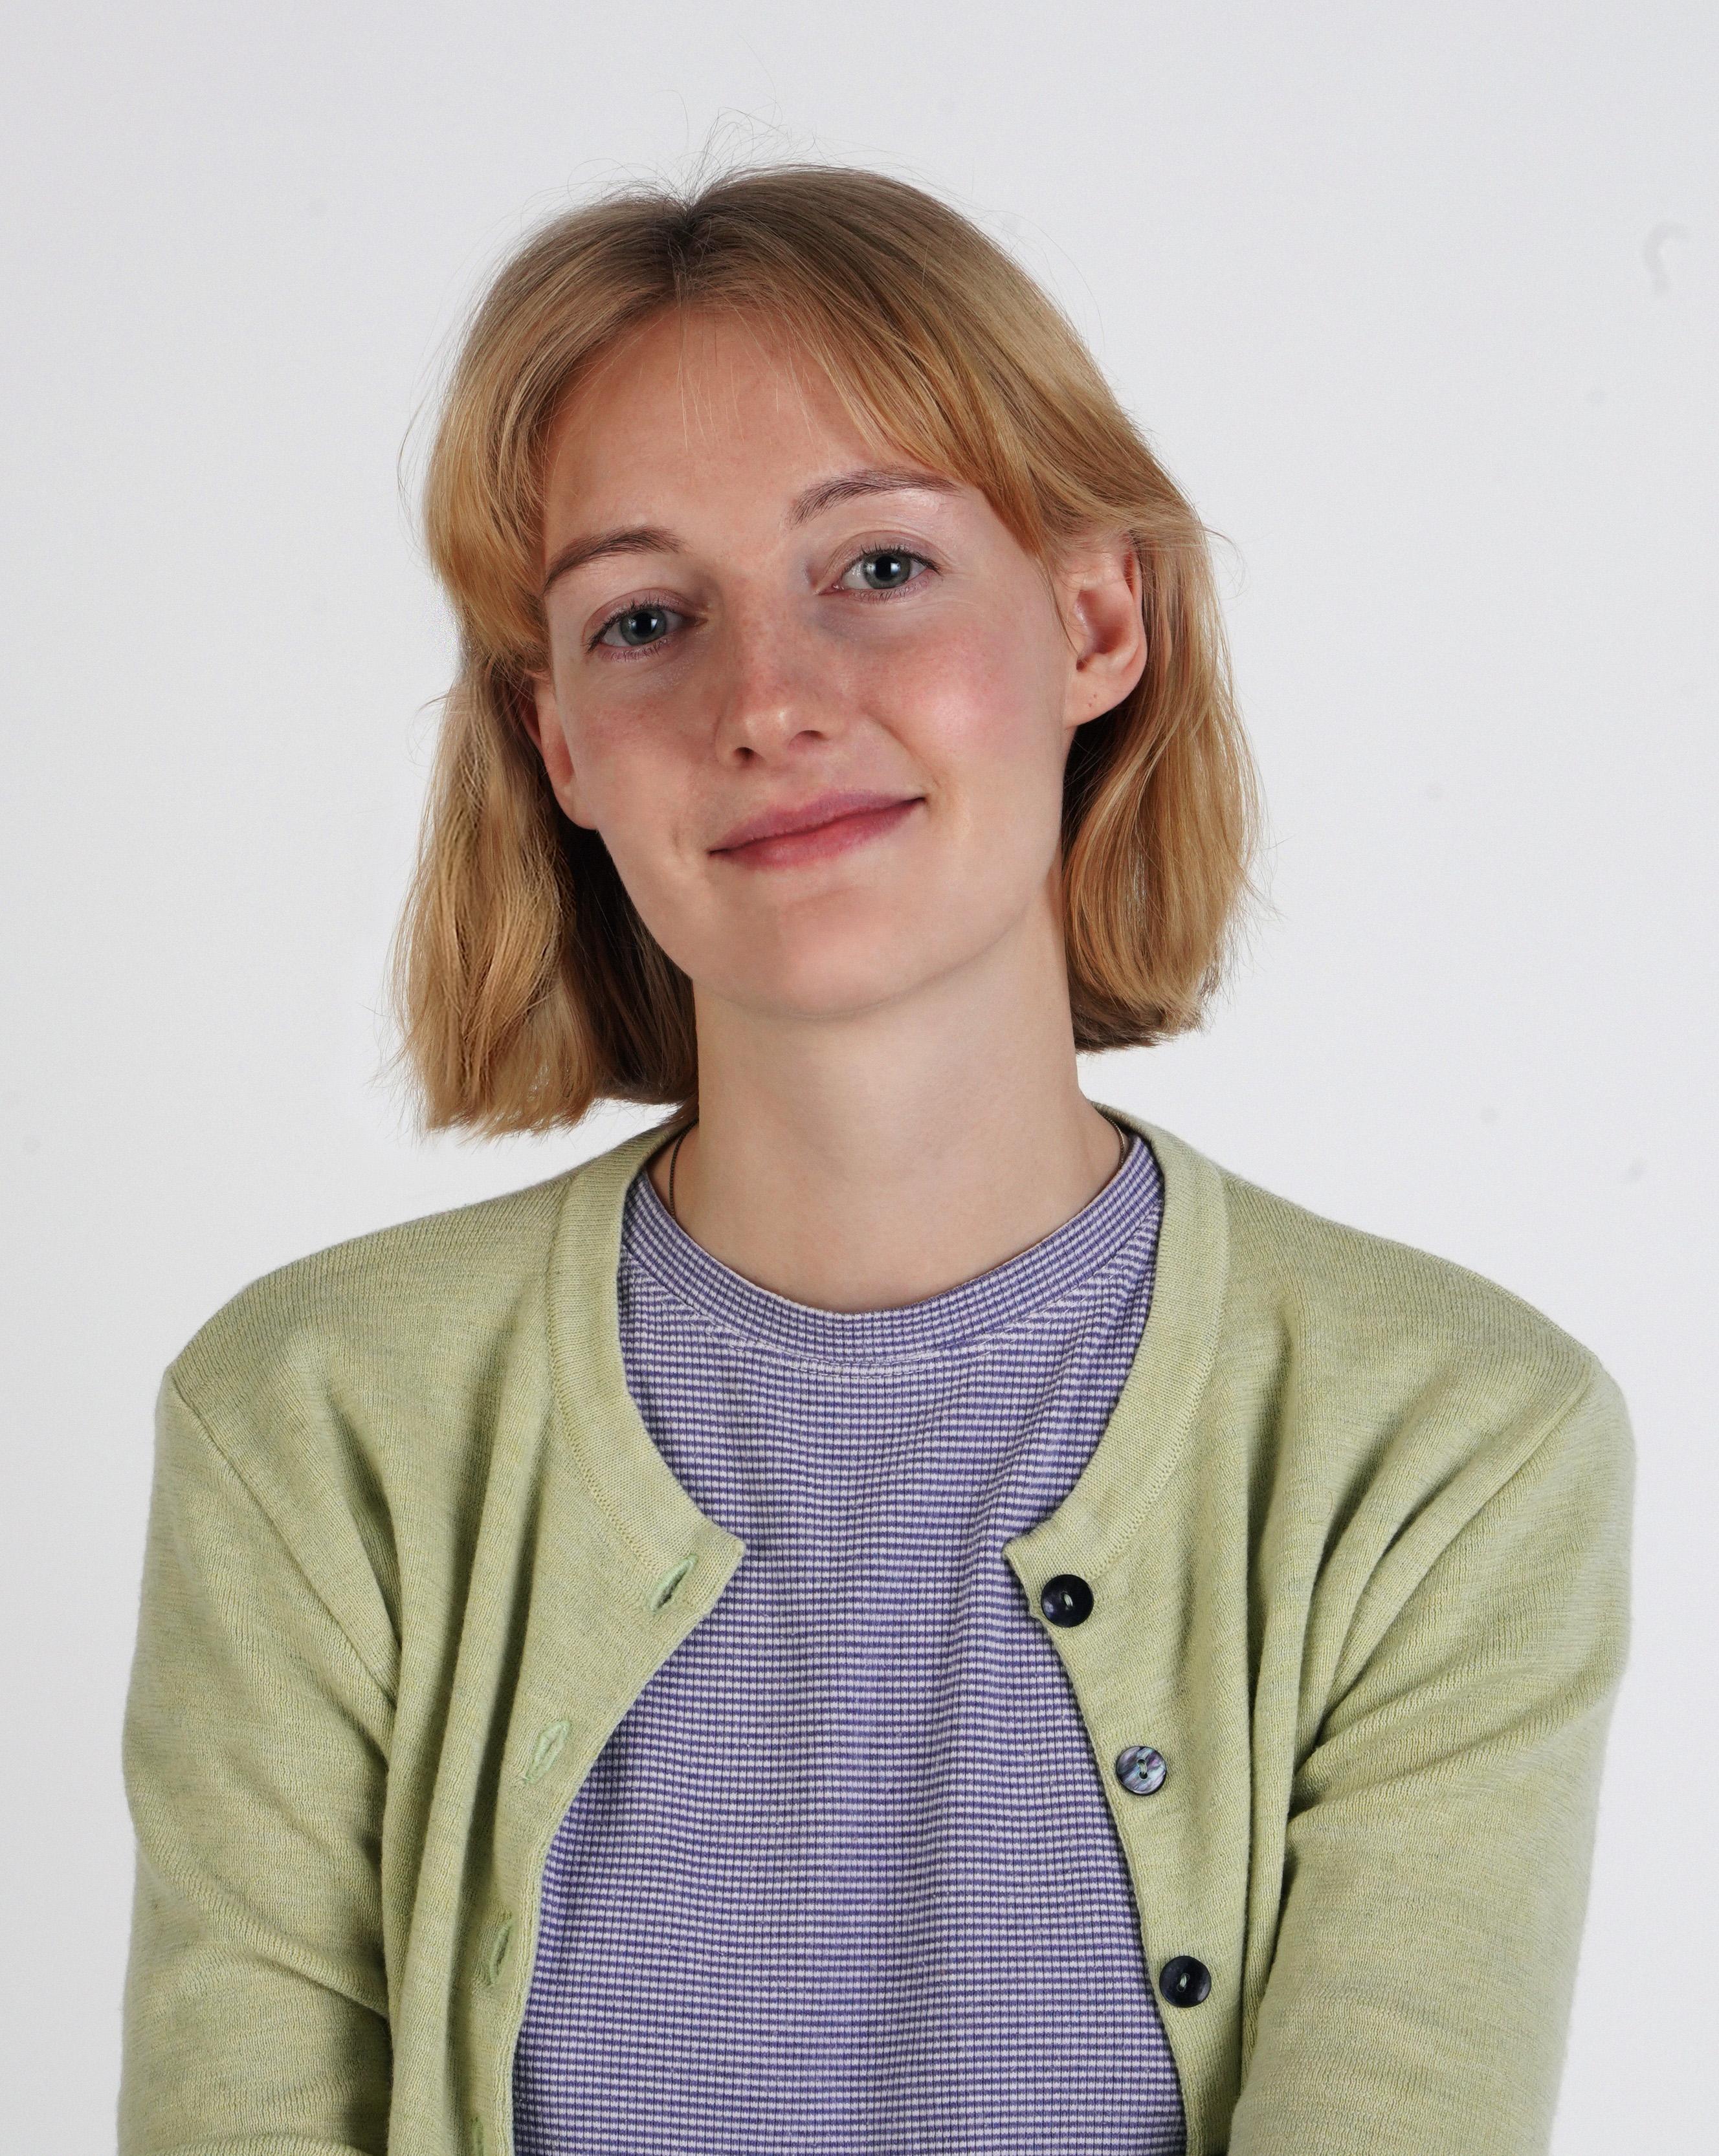 Hannah Mileman